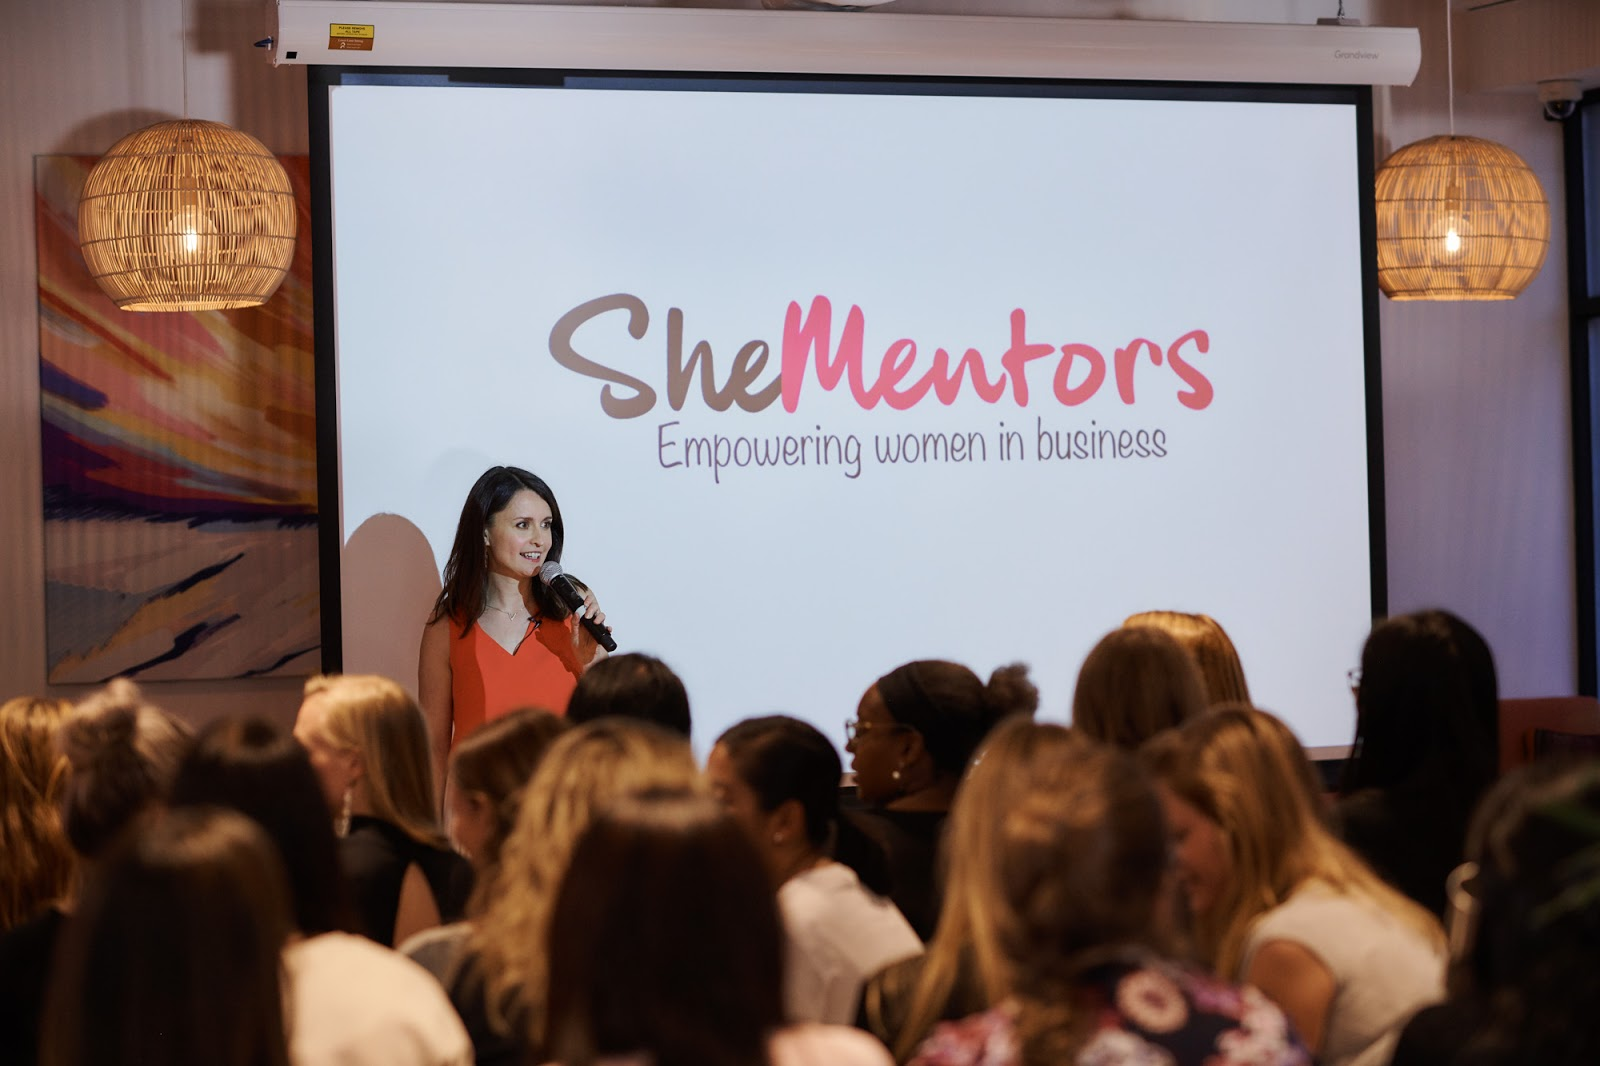 Women watch She Mentor's presentation